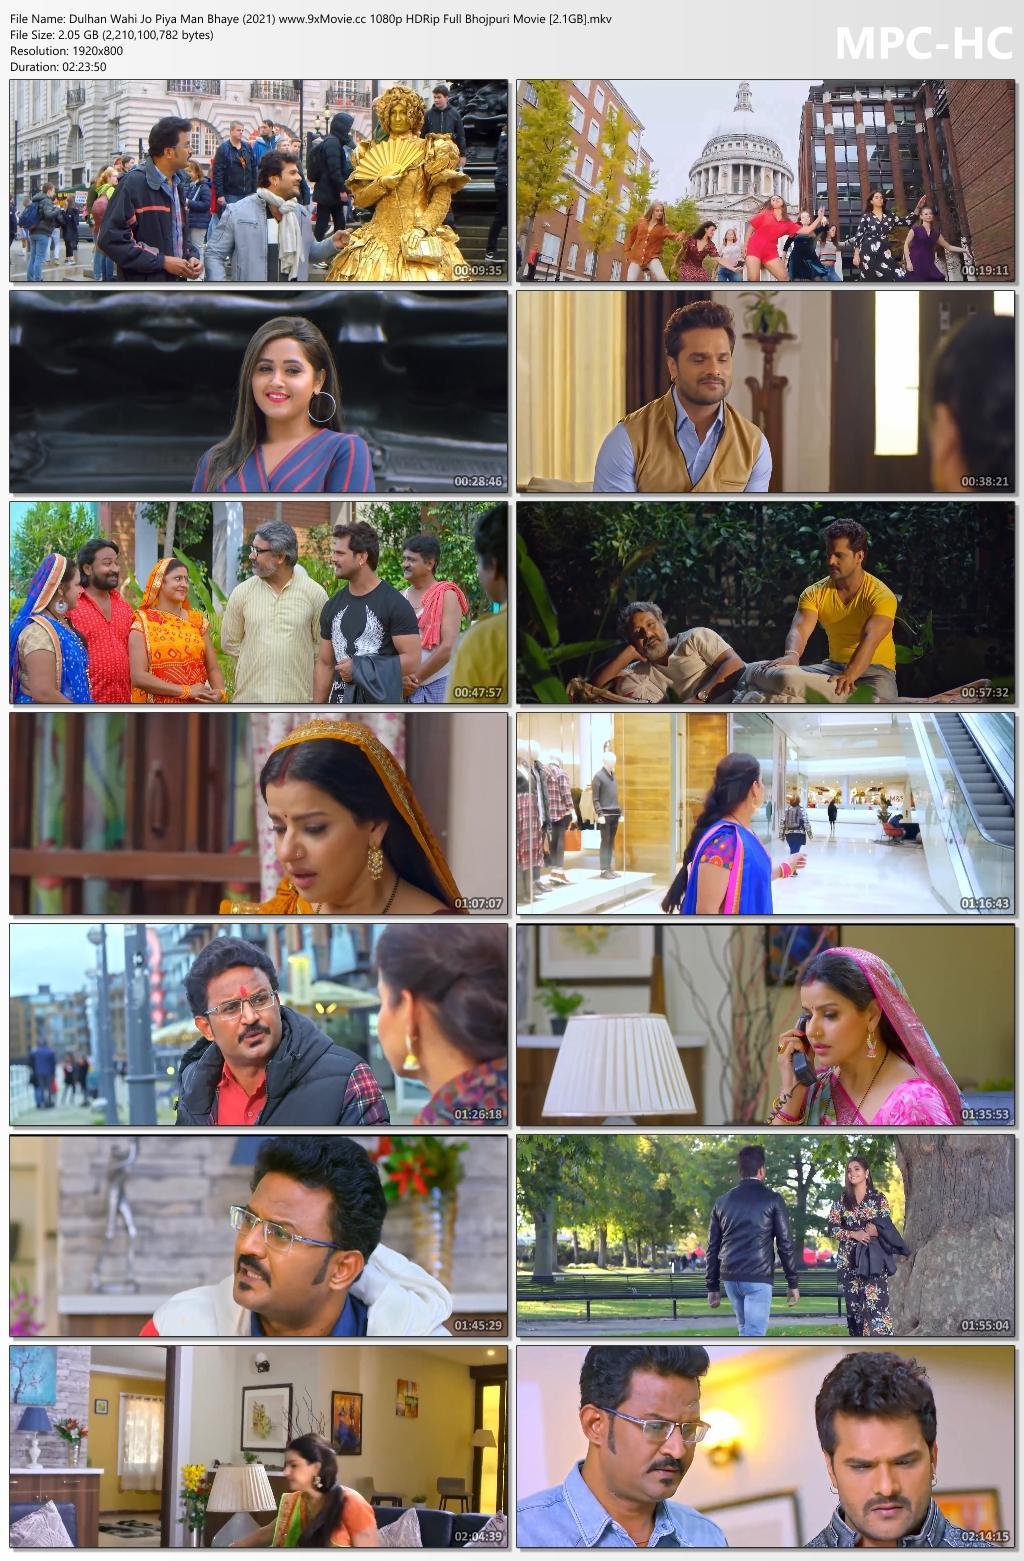 Dulhan-Wahi-Jo-Piya-Man-Bhaye-2021-www-9x-Movie-cc-1080p-HDRip-Full-Bhojpuri-Movie-2-1-GB-mkv